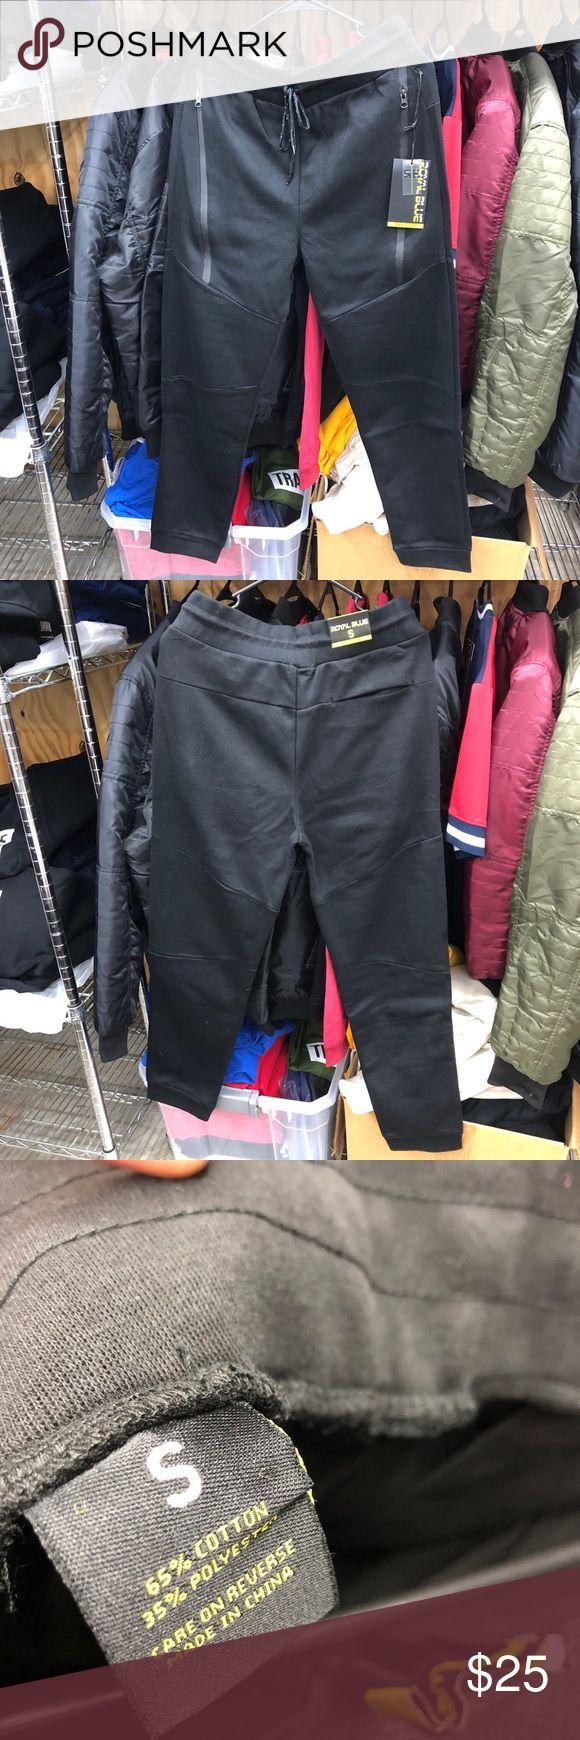 Tech Fleece Joggers Black Boutique Fleece joggers